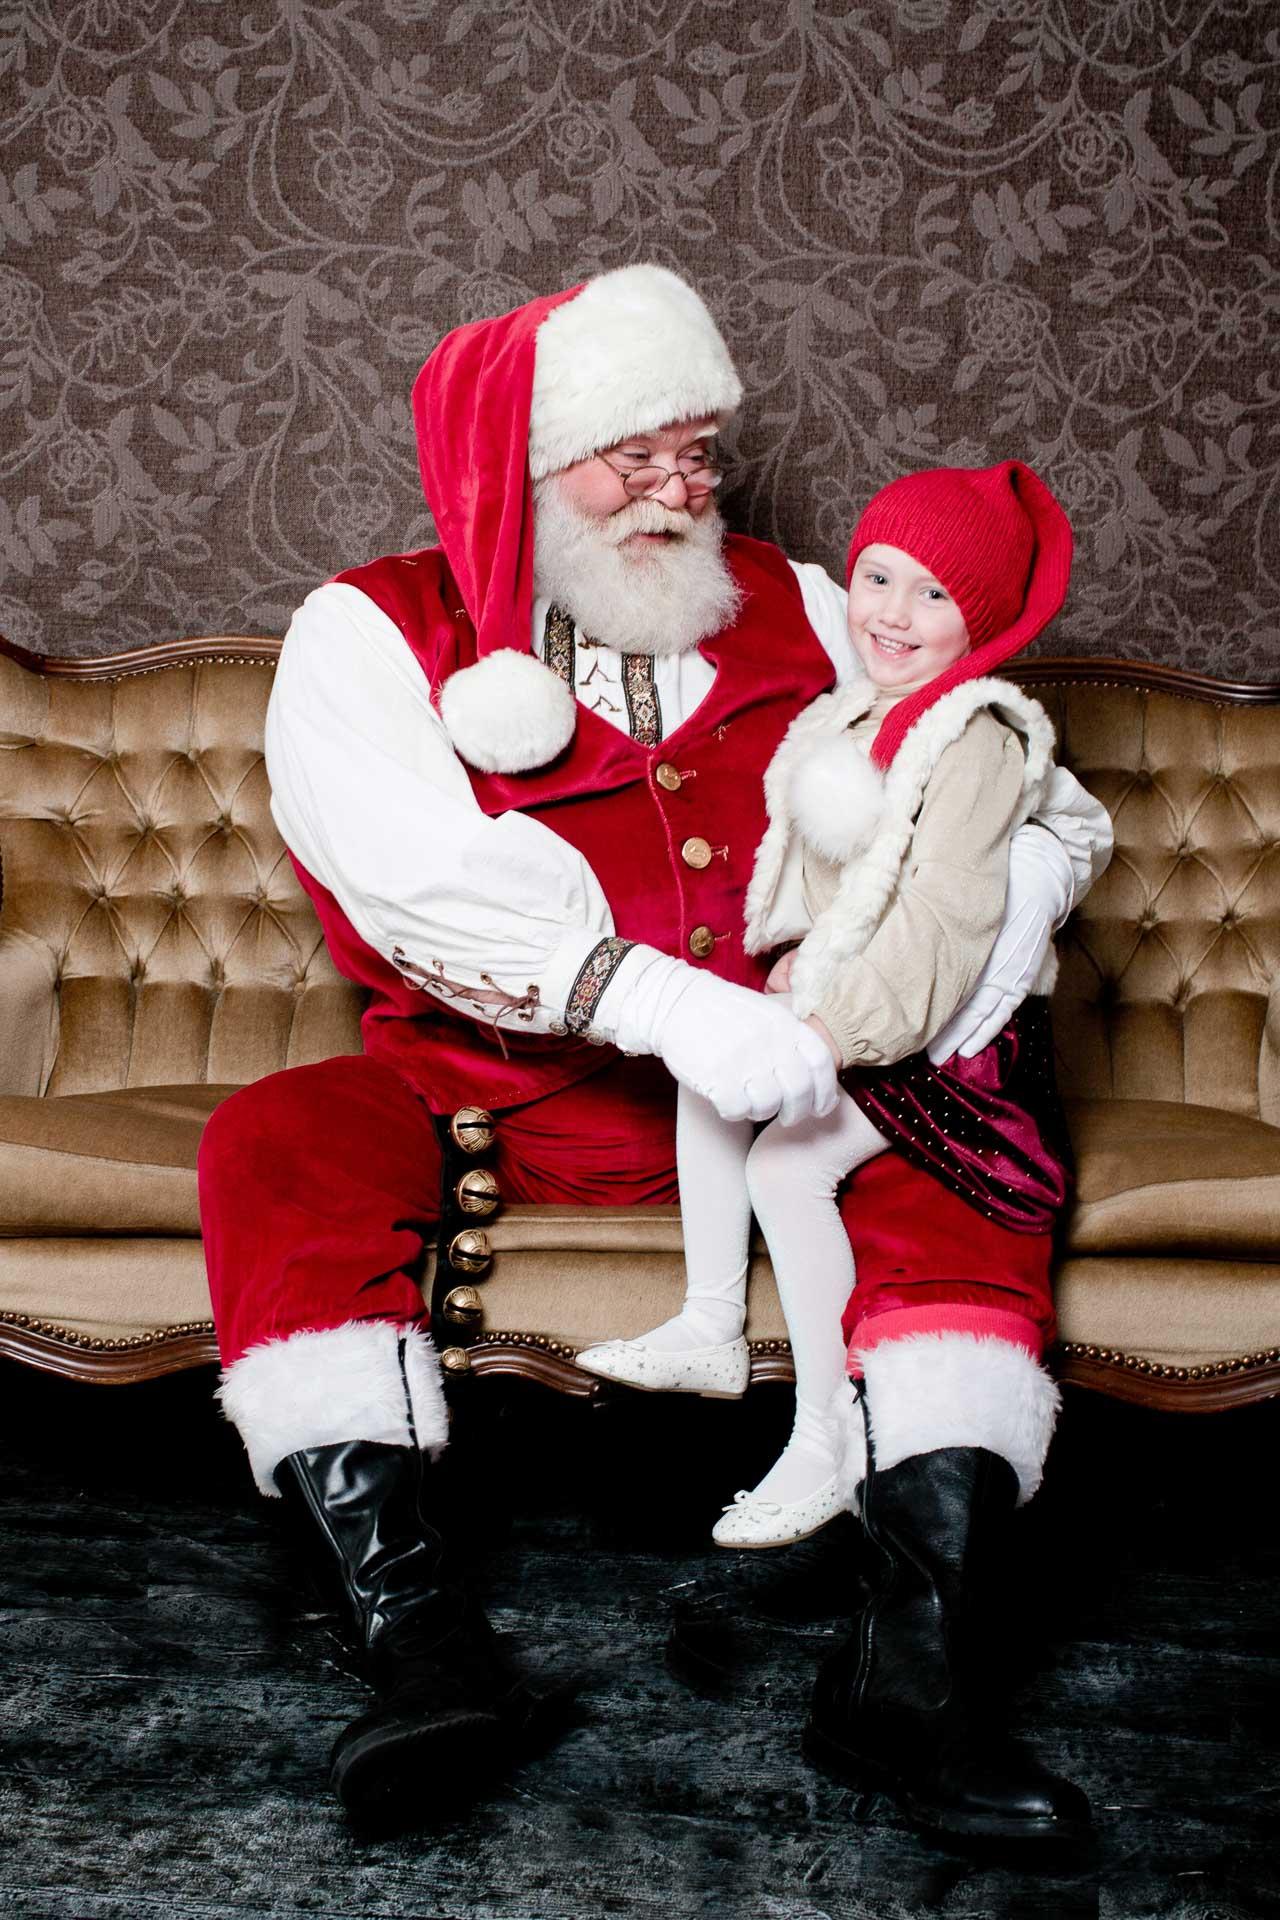 Det er snart jul og tid til julefotografering…..